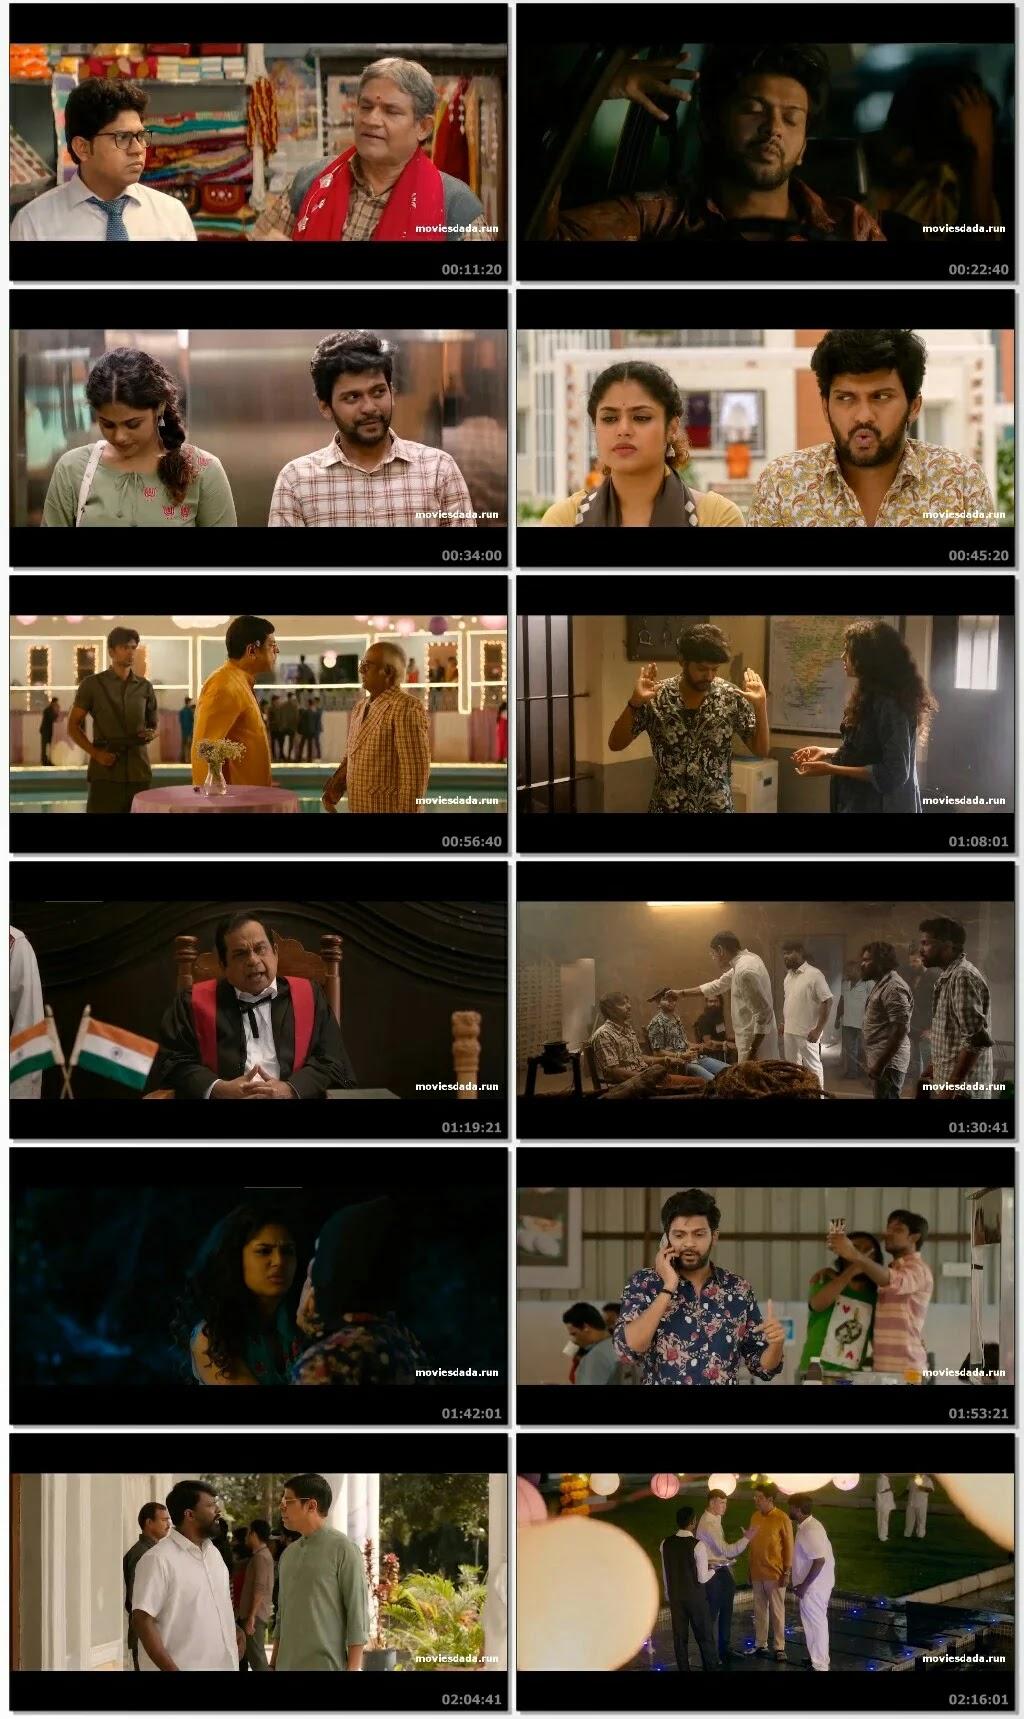 Jathi Ratnalu (2021) Movie Hindi Dubbed free download